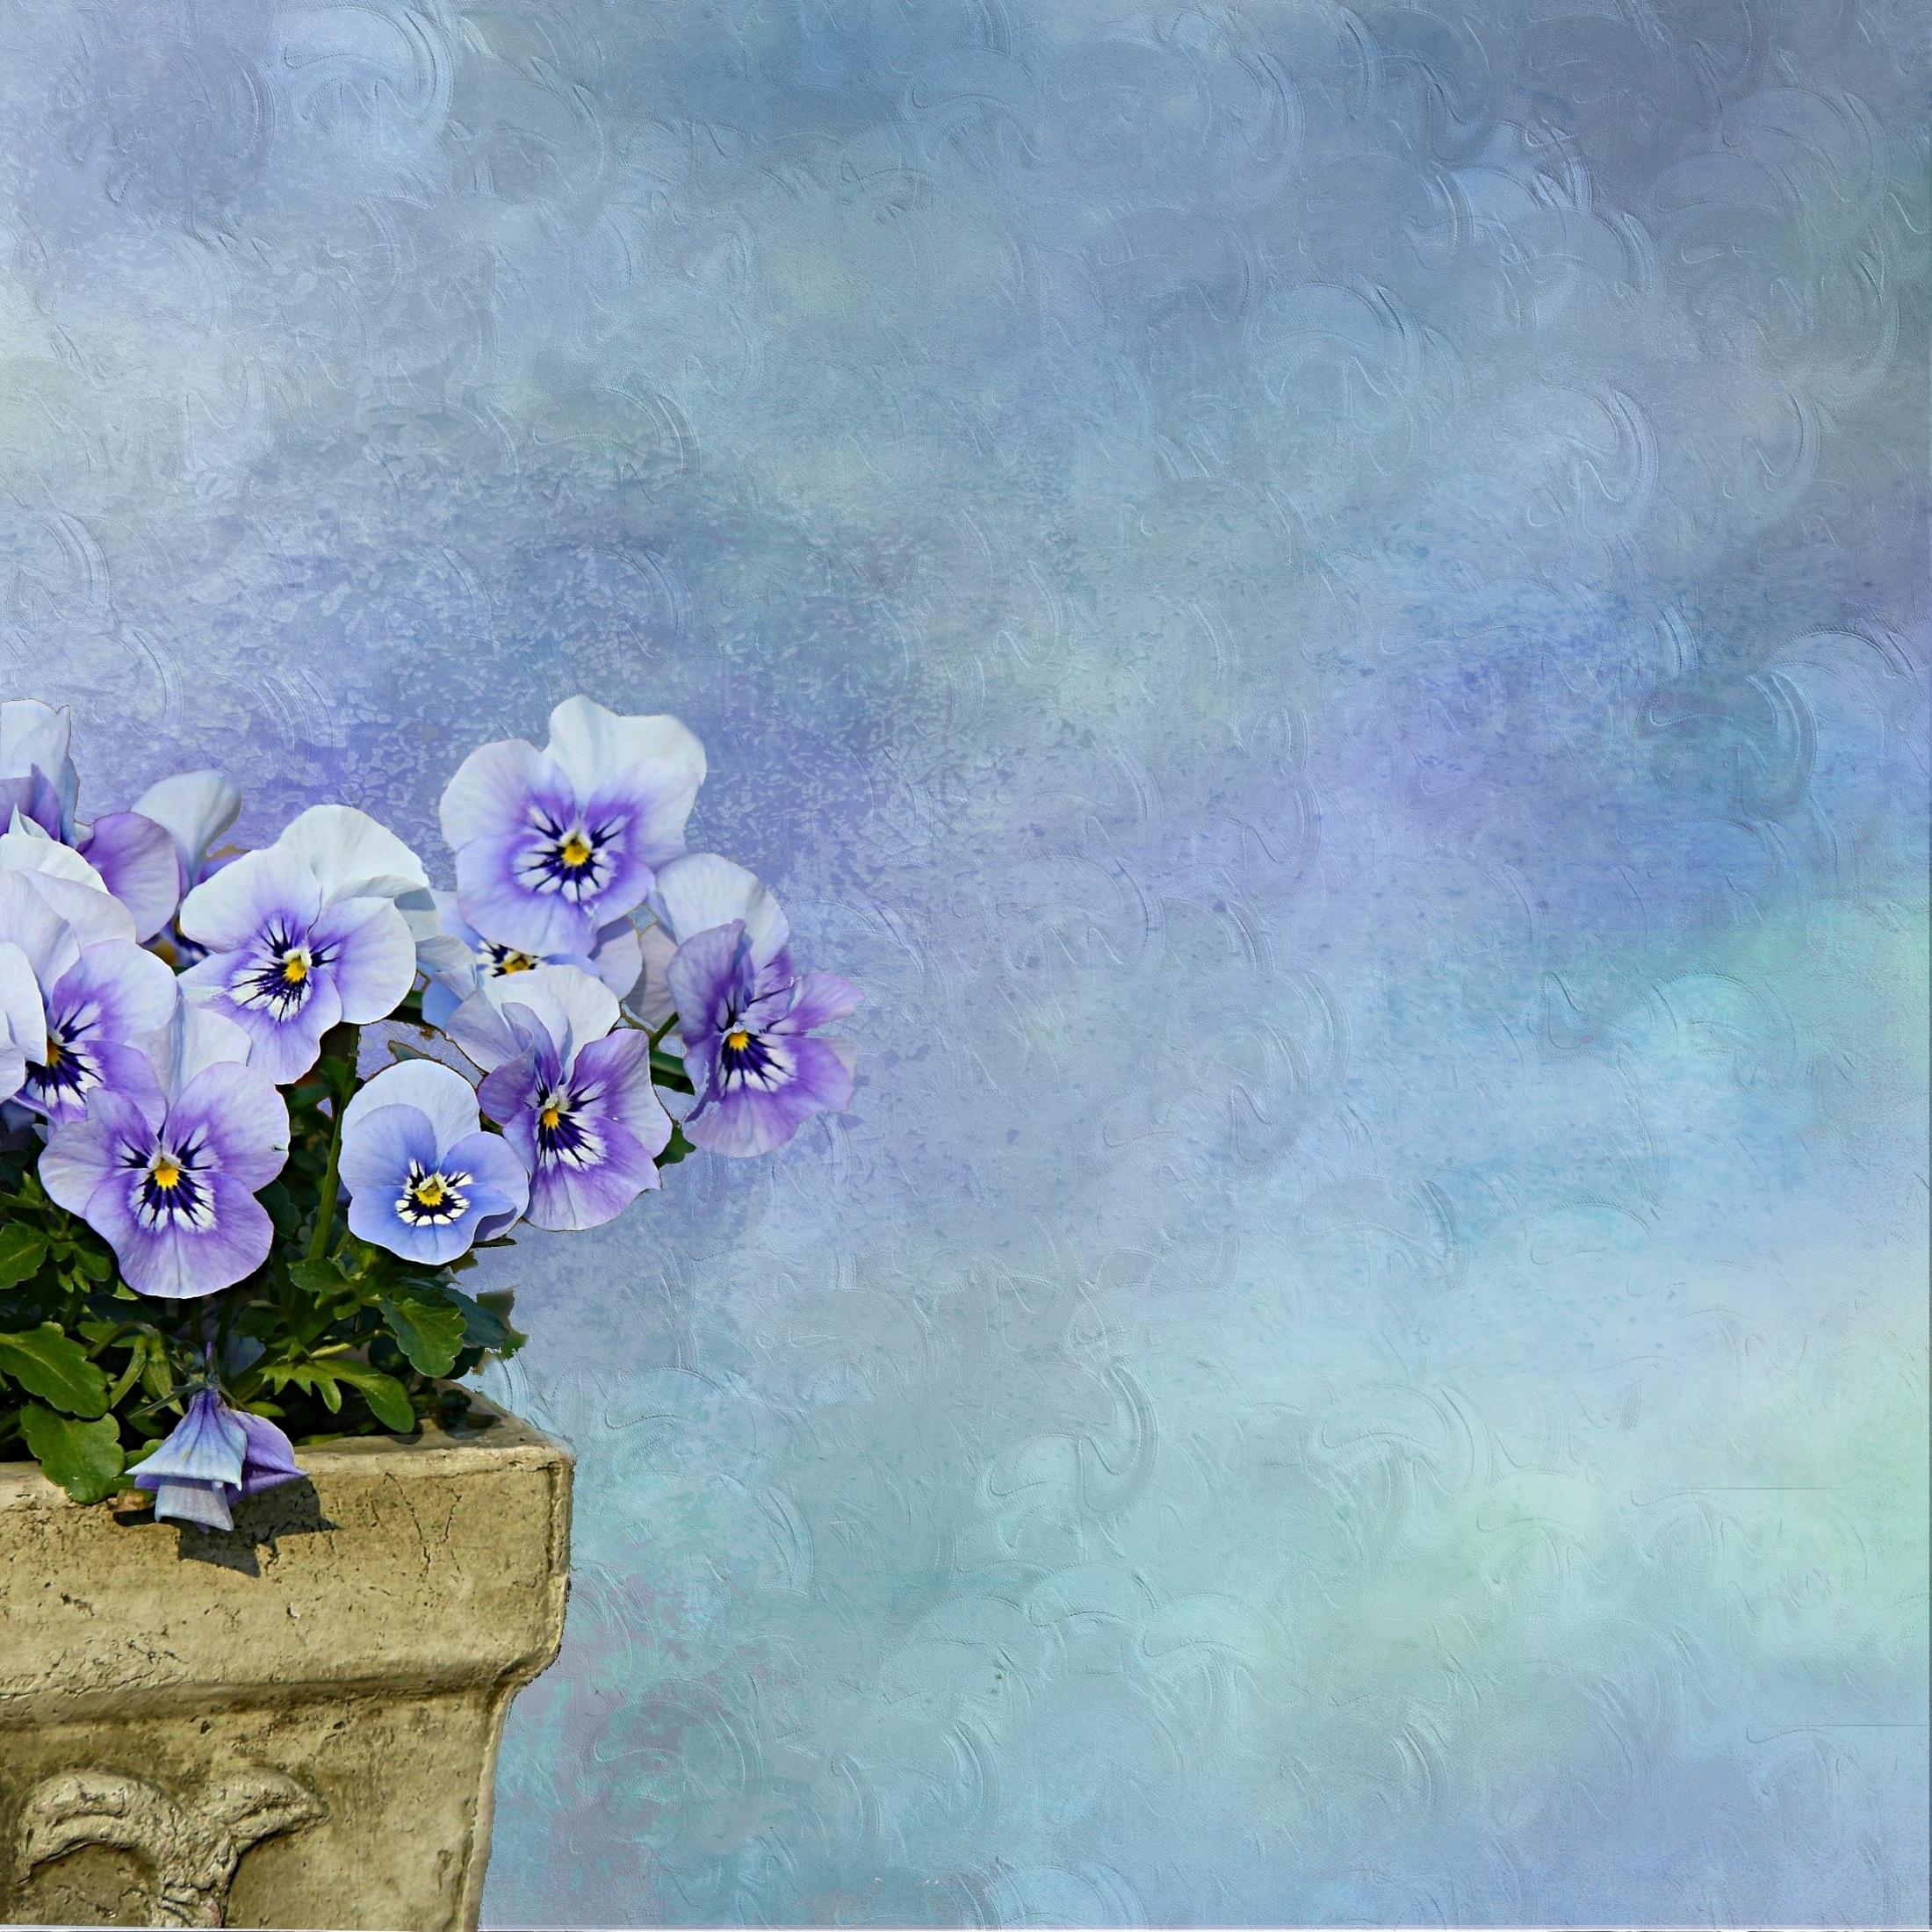 2dc0044ab616 Free Images   blossom